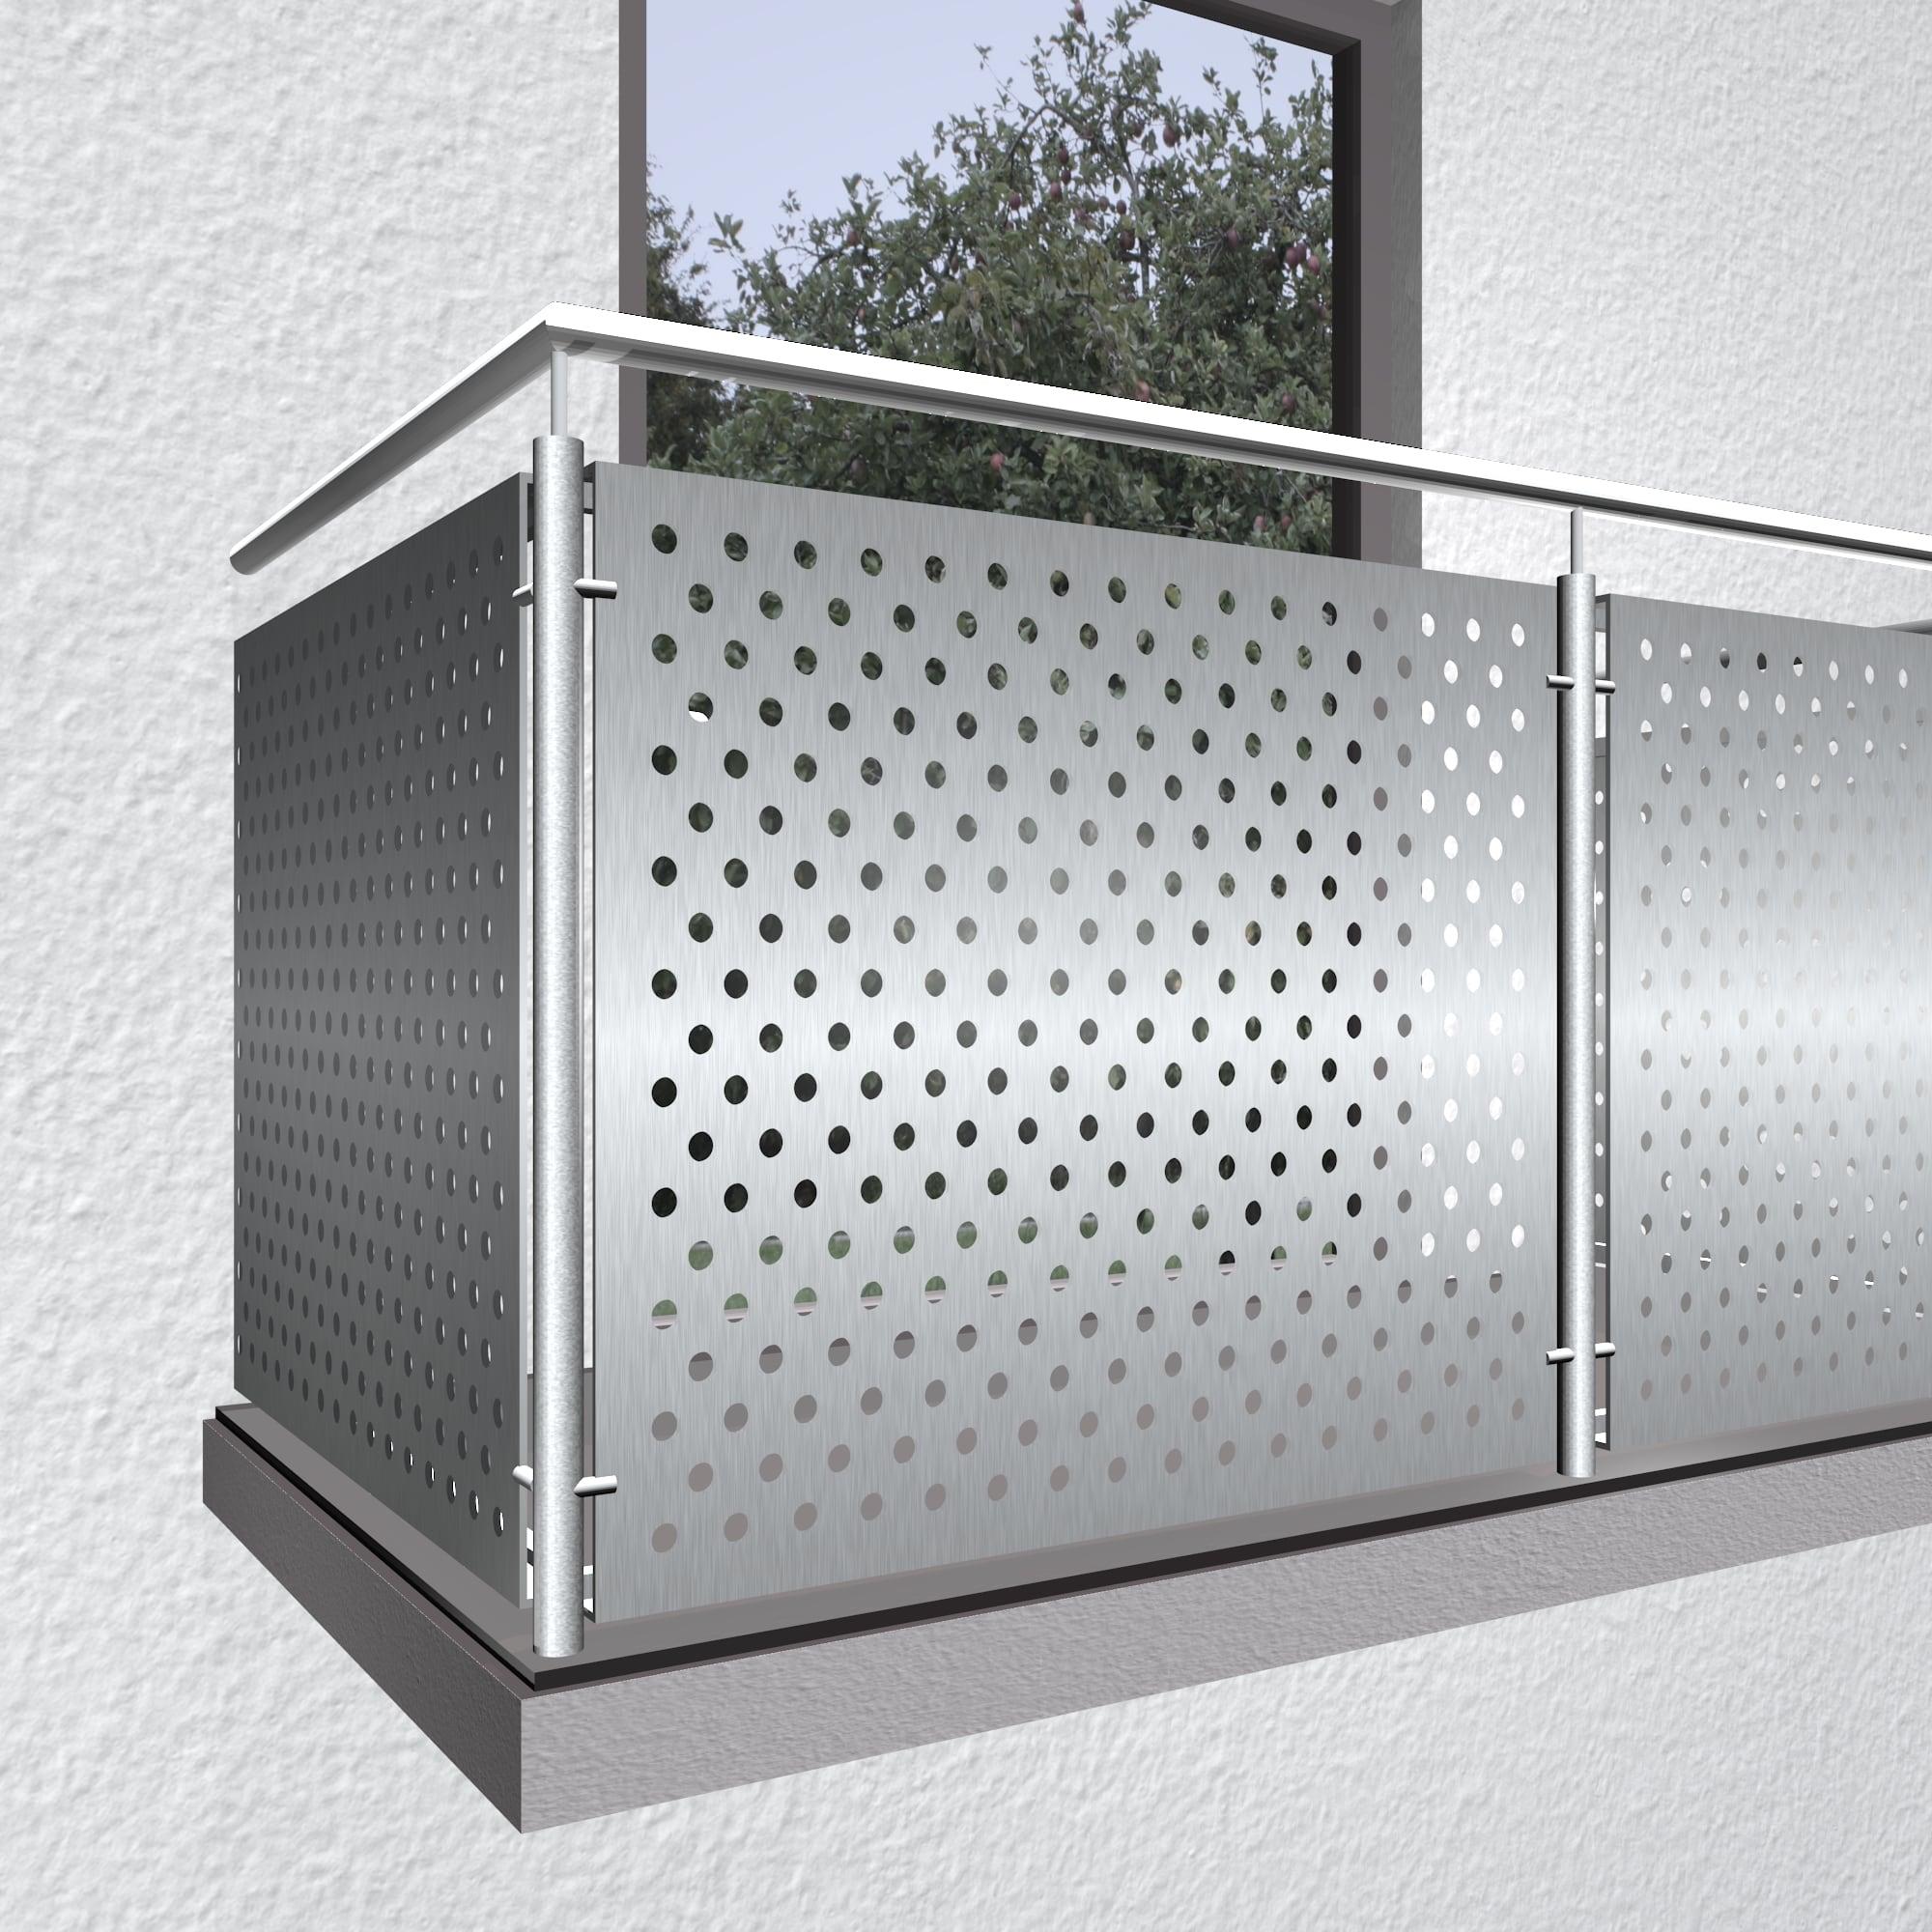 Balkonverkleidung Edelstahl RL VE